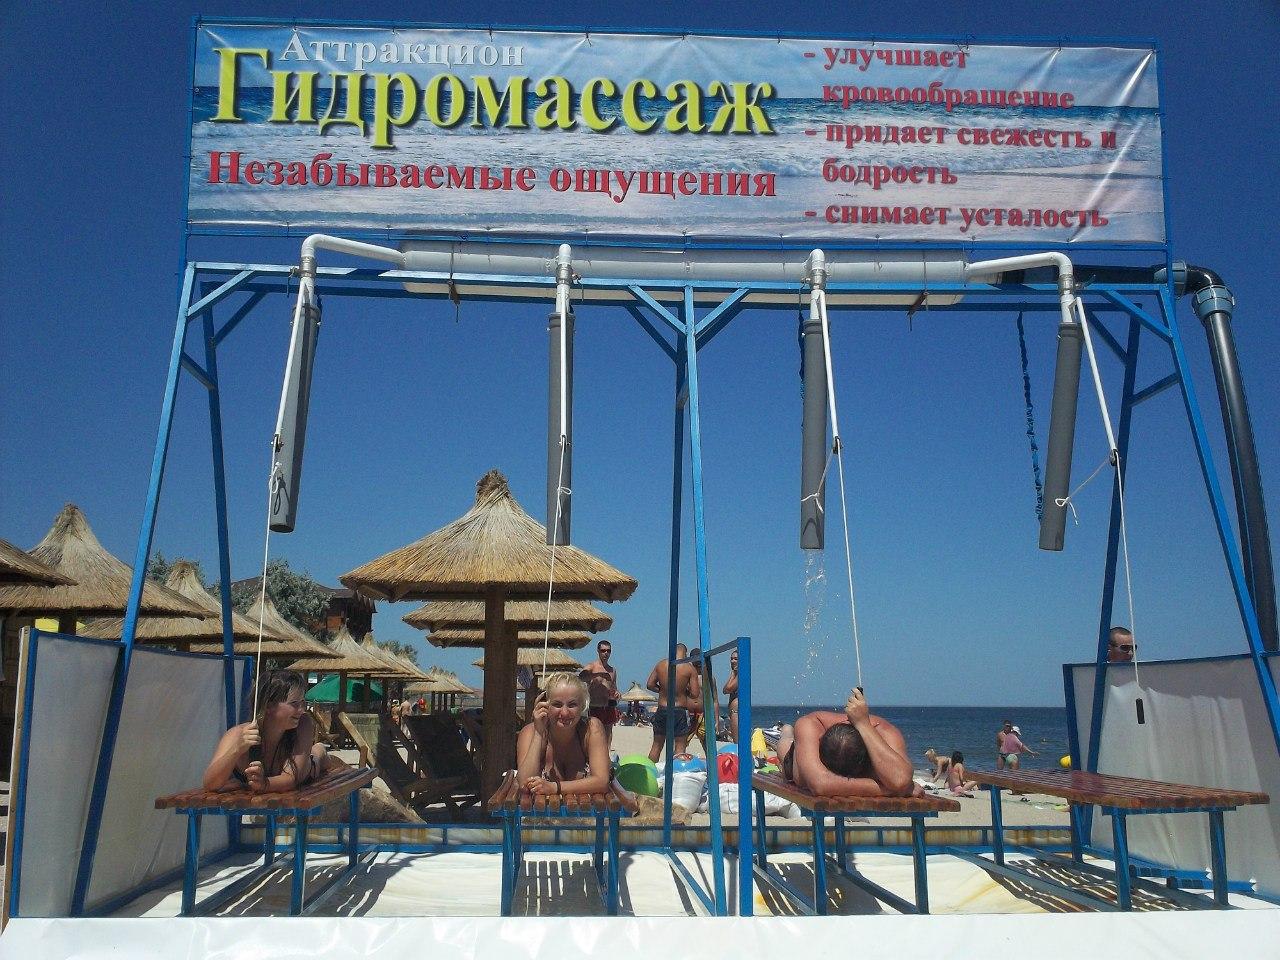 Азовское море. Бердянск. 2012 г. IHS3Z0XKQZM